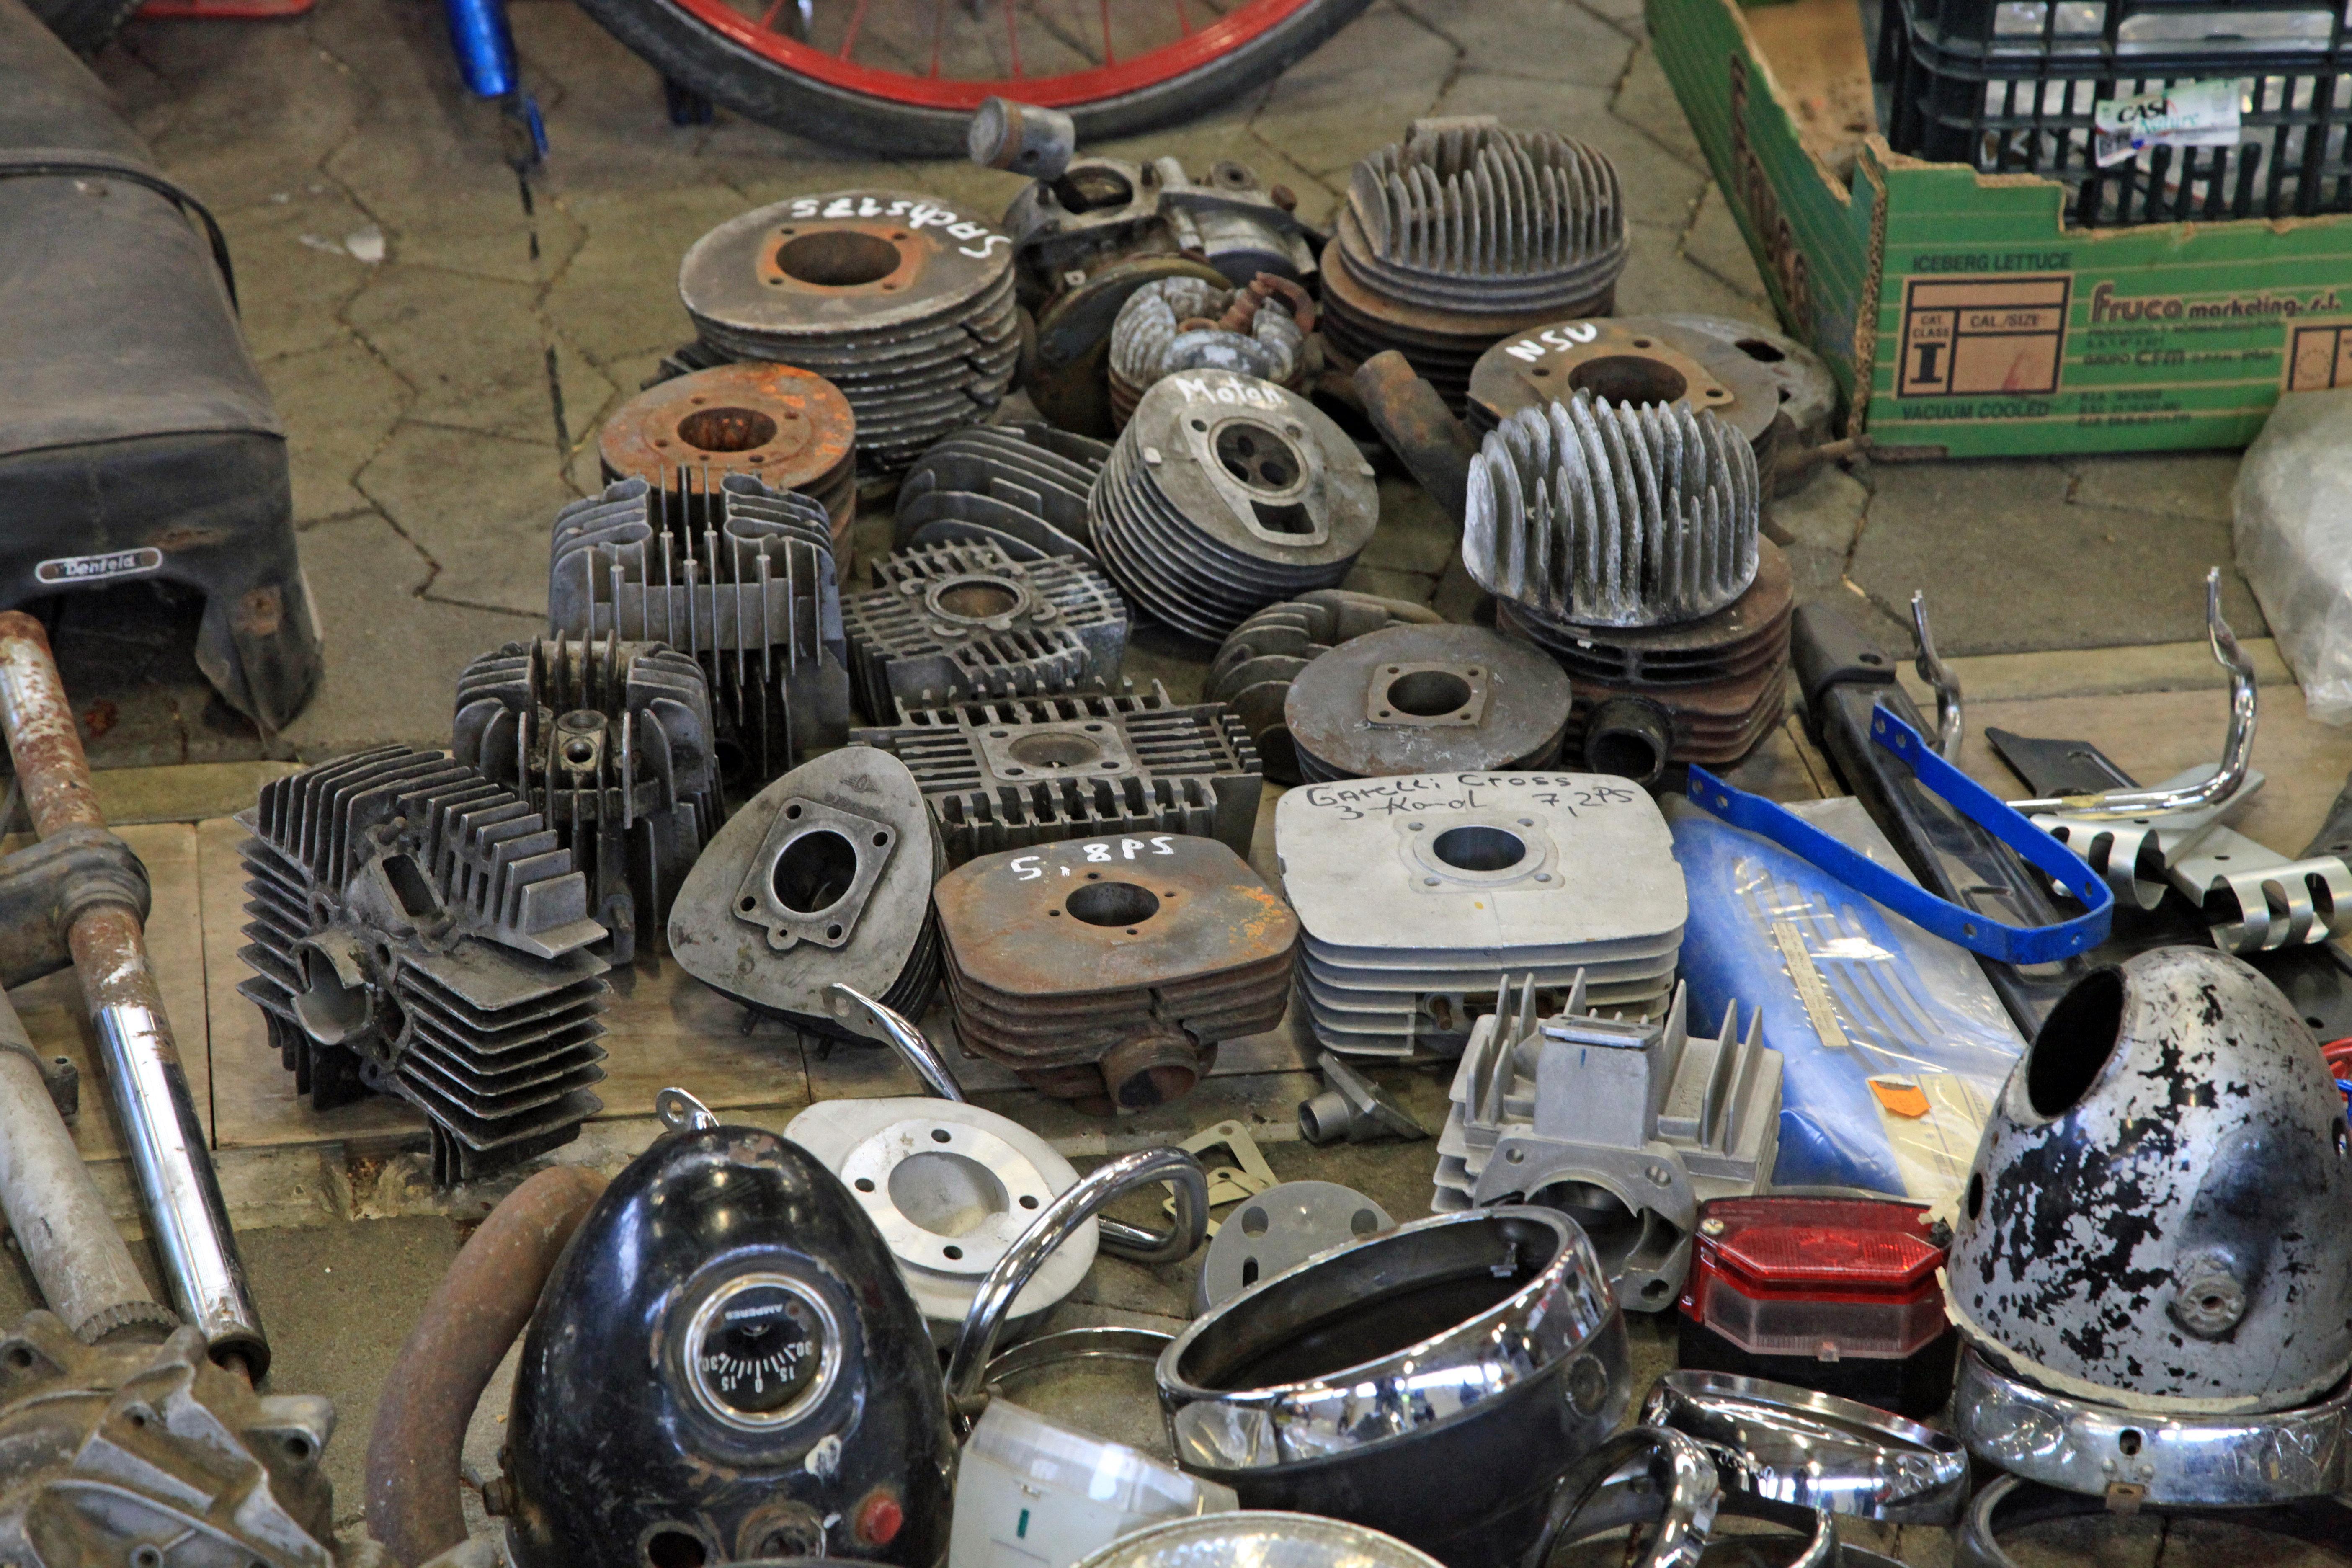 Free Images : technology, repair, vehicle, motorcycle, metal, engine ...